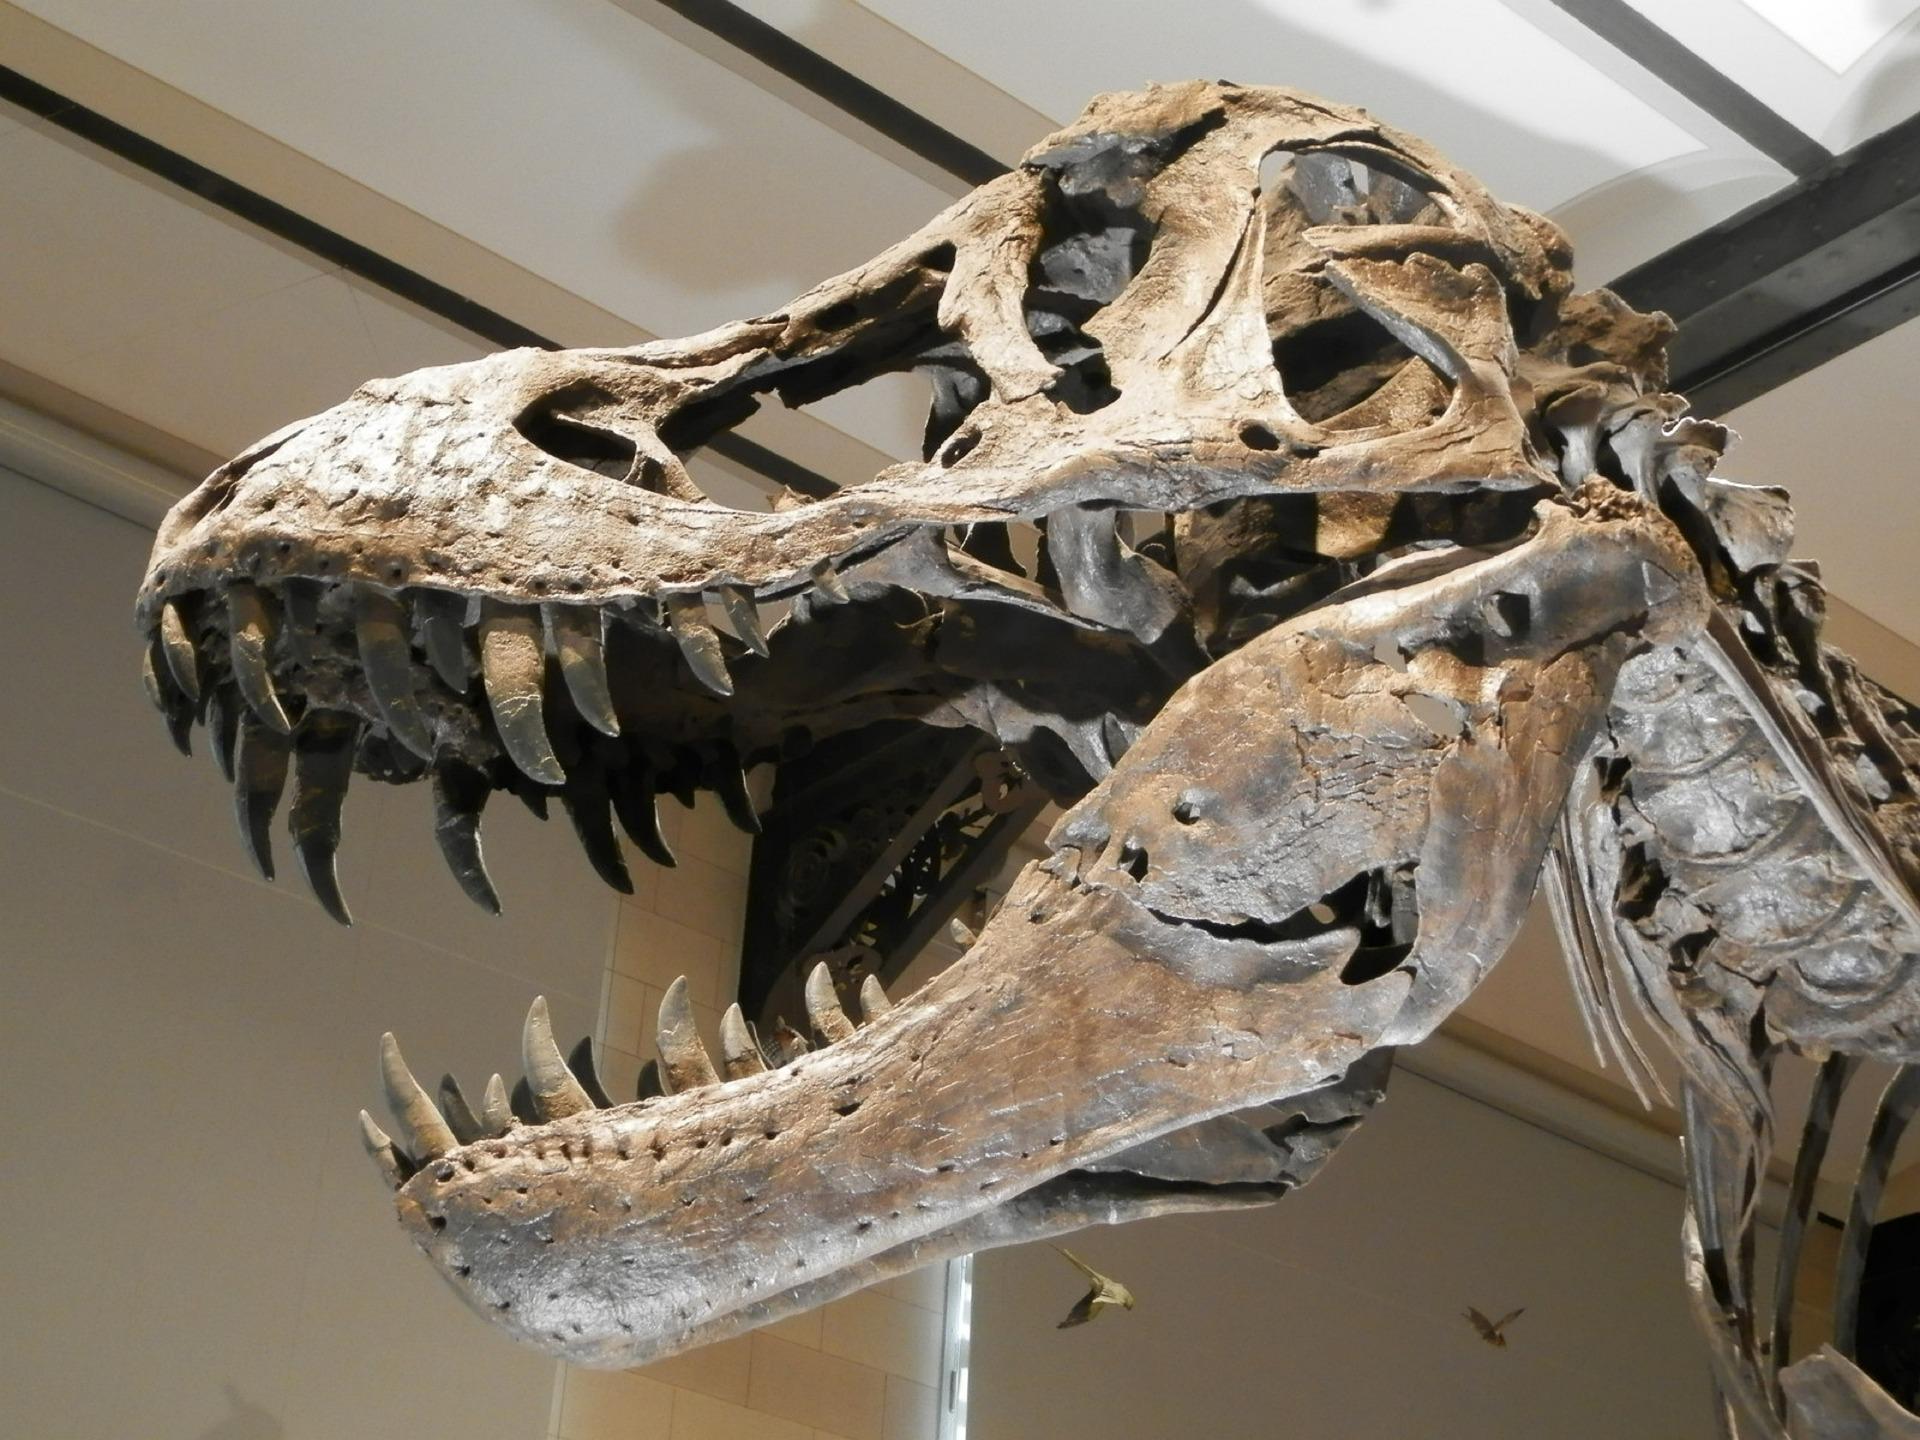 dinosaur-2628309_1920.jpg